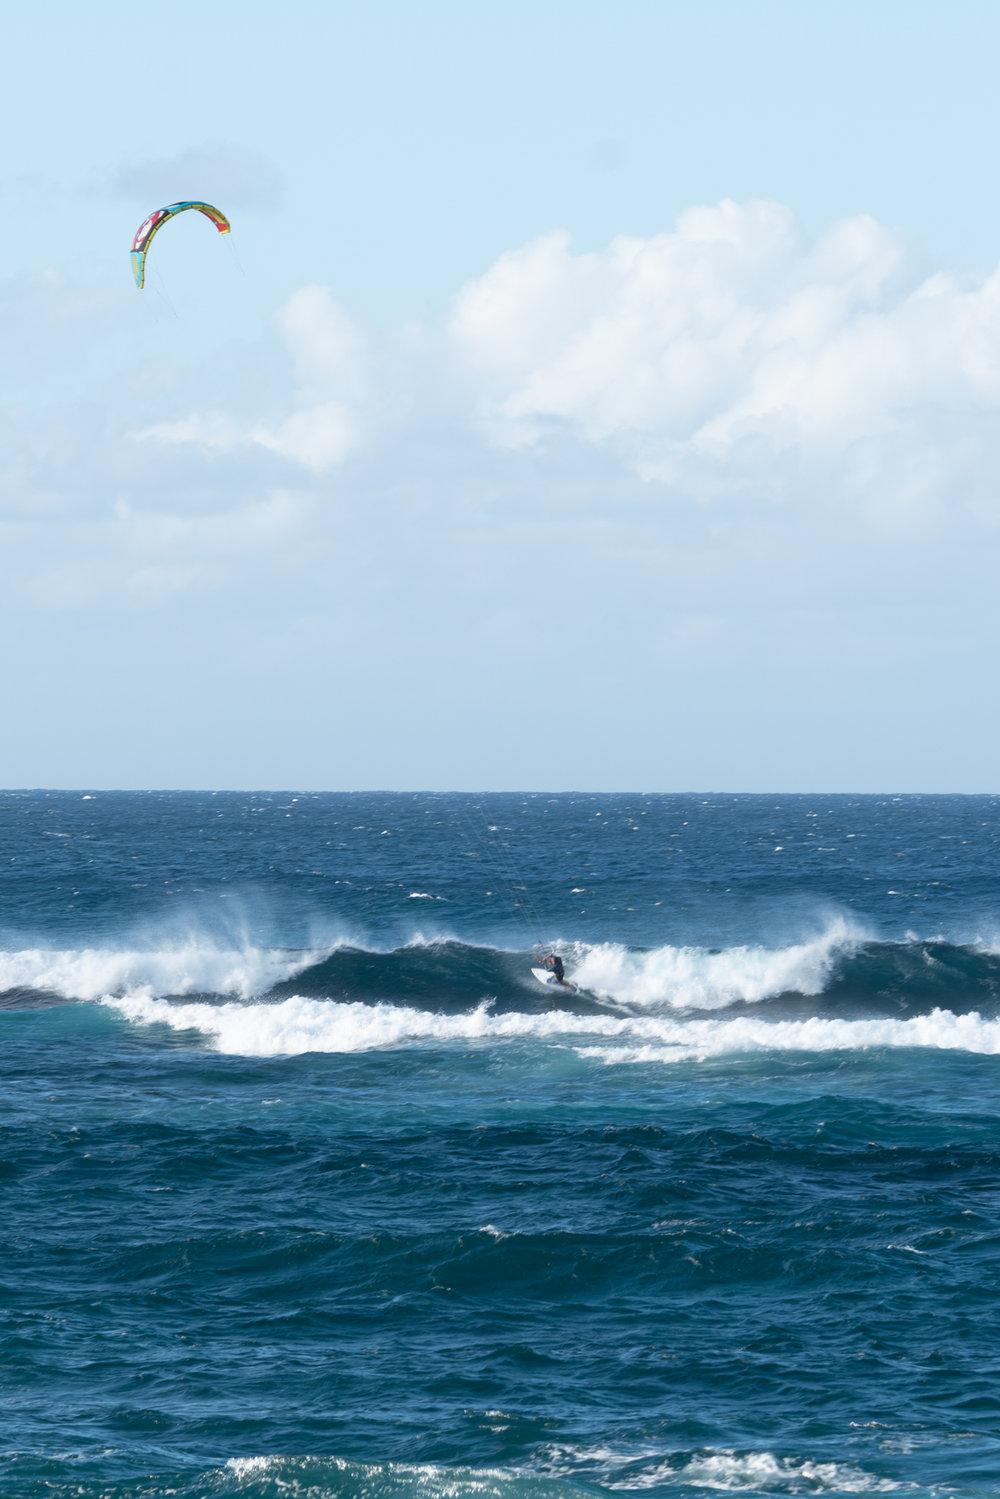 Maui-Trip-Kite-19.jpg